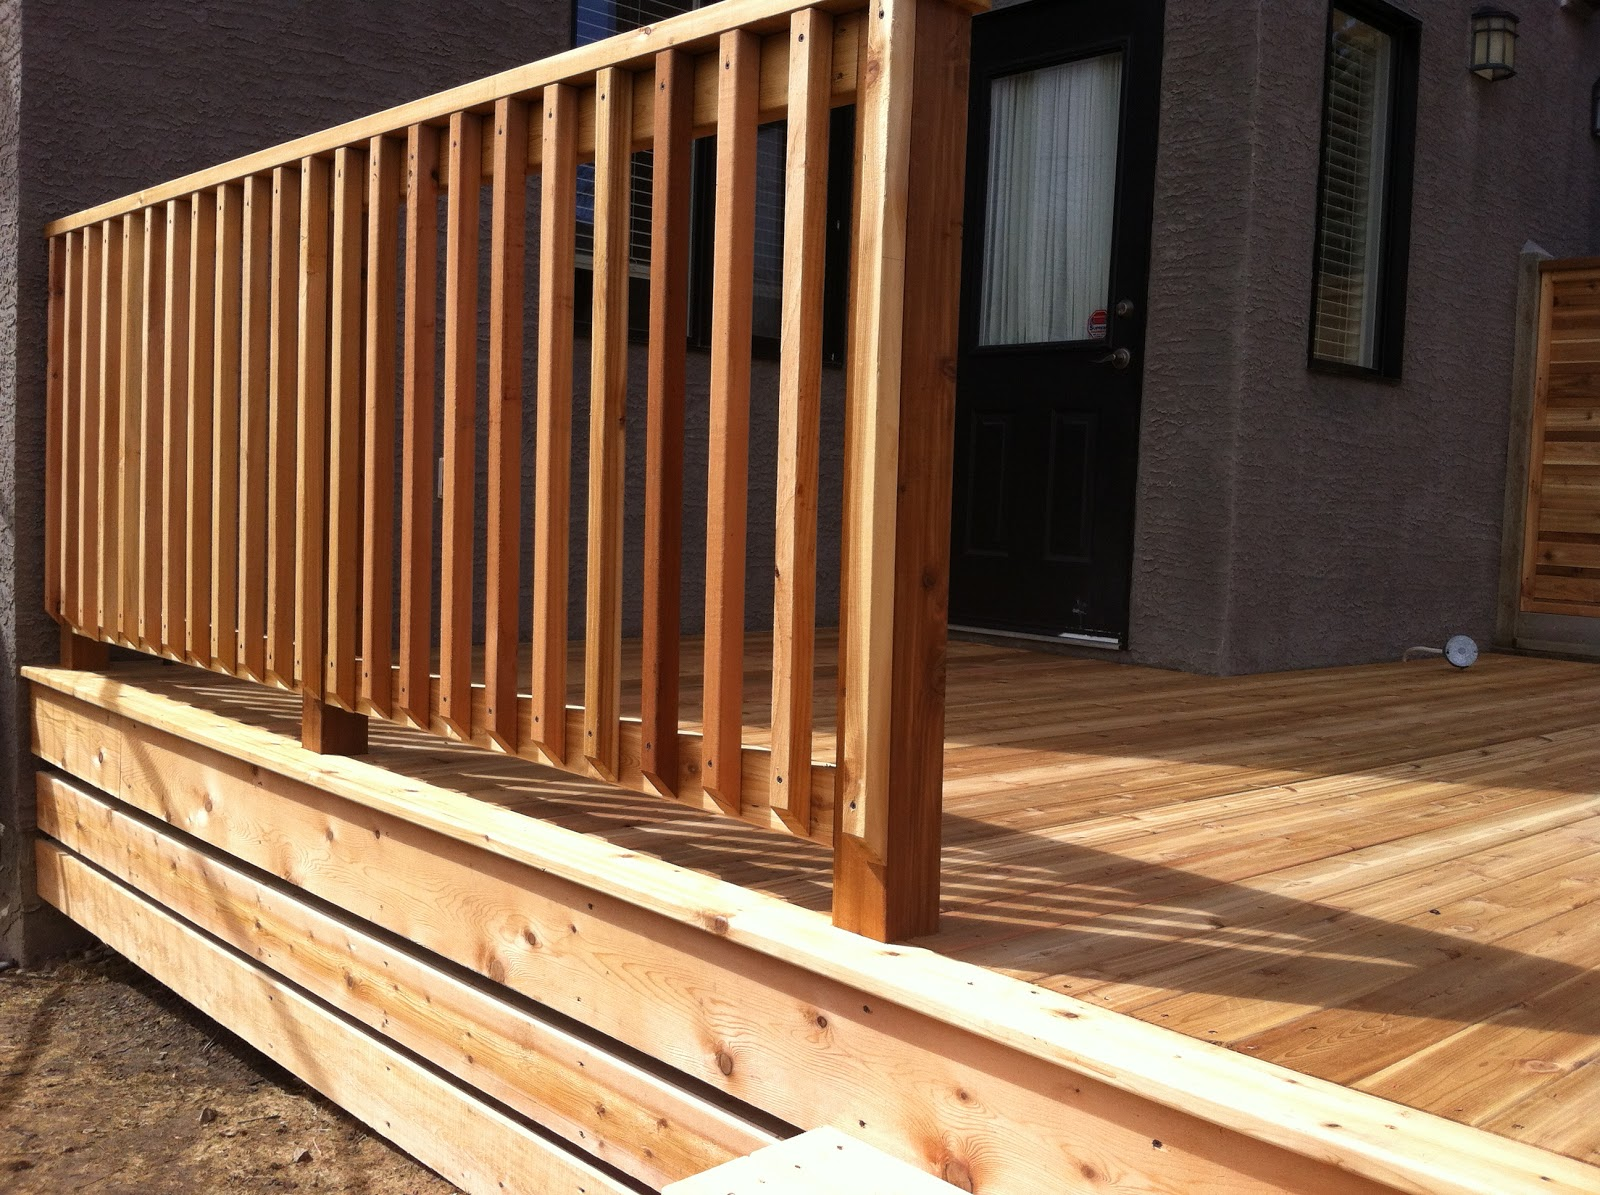 Deck Railing Designs | Joy Studio Design Gallery - Best Design